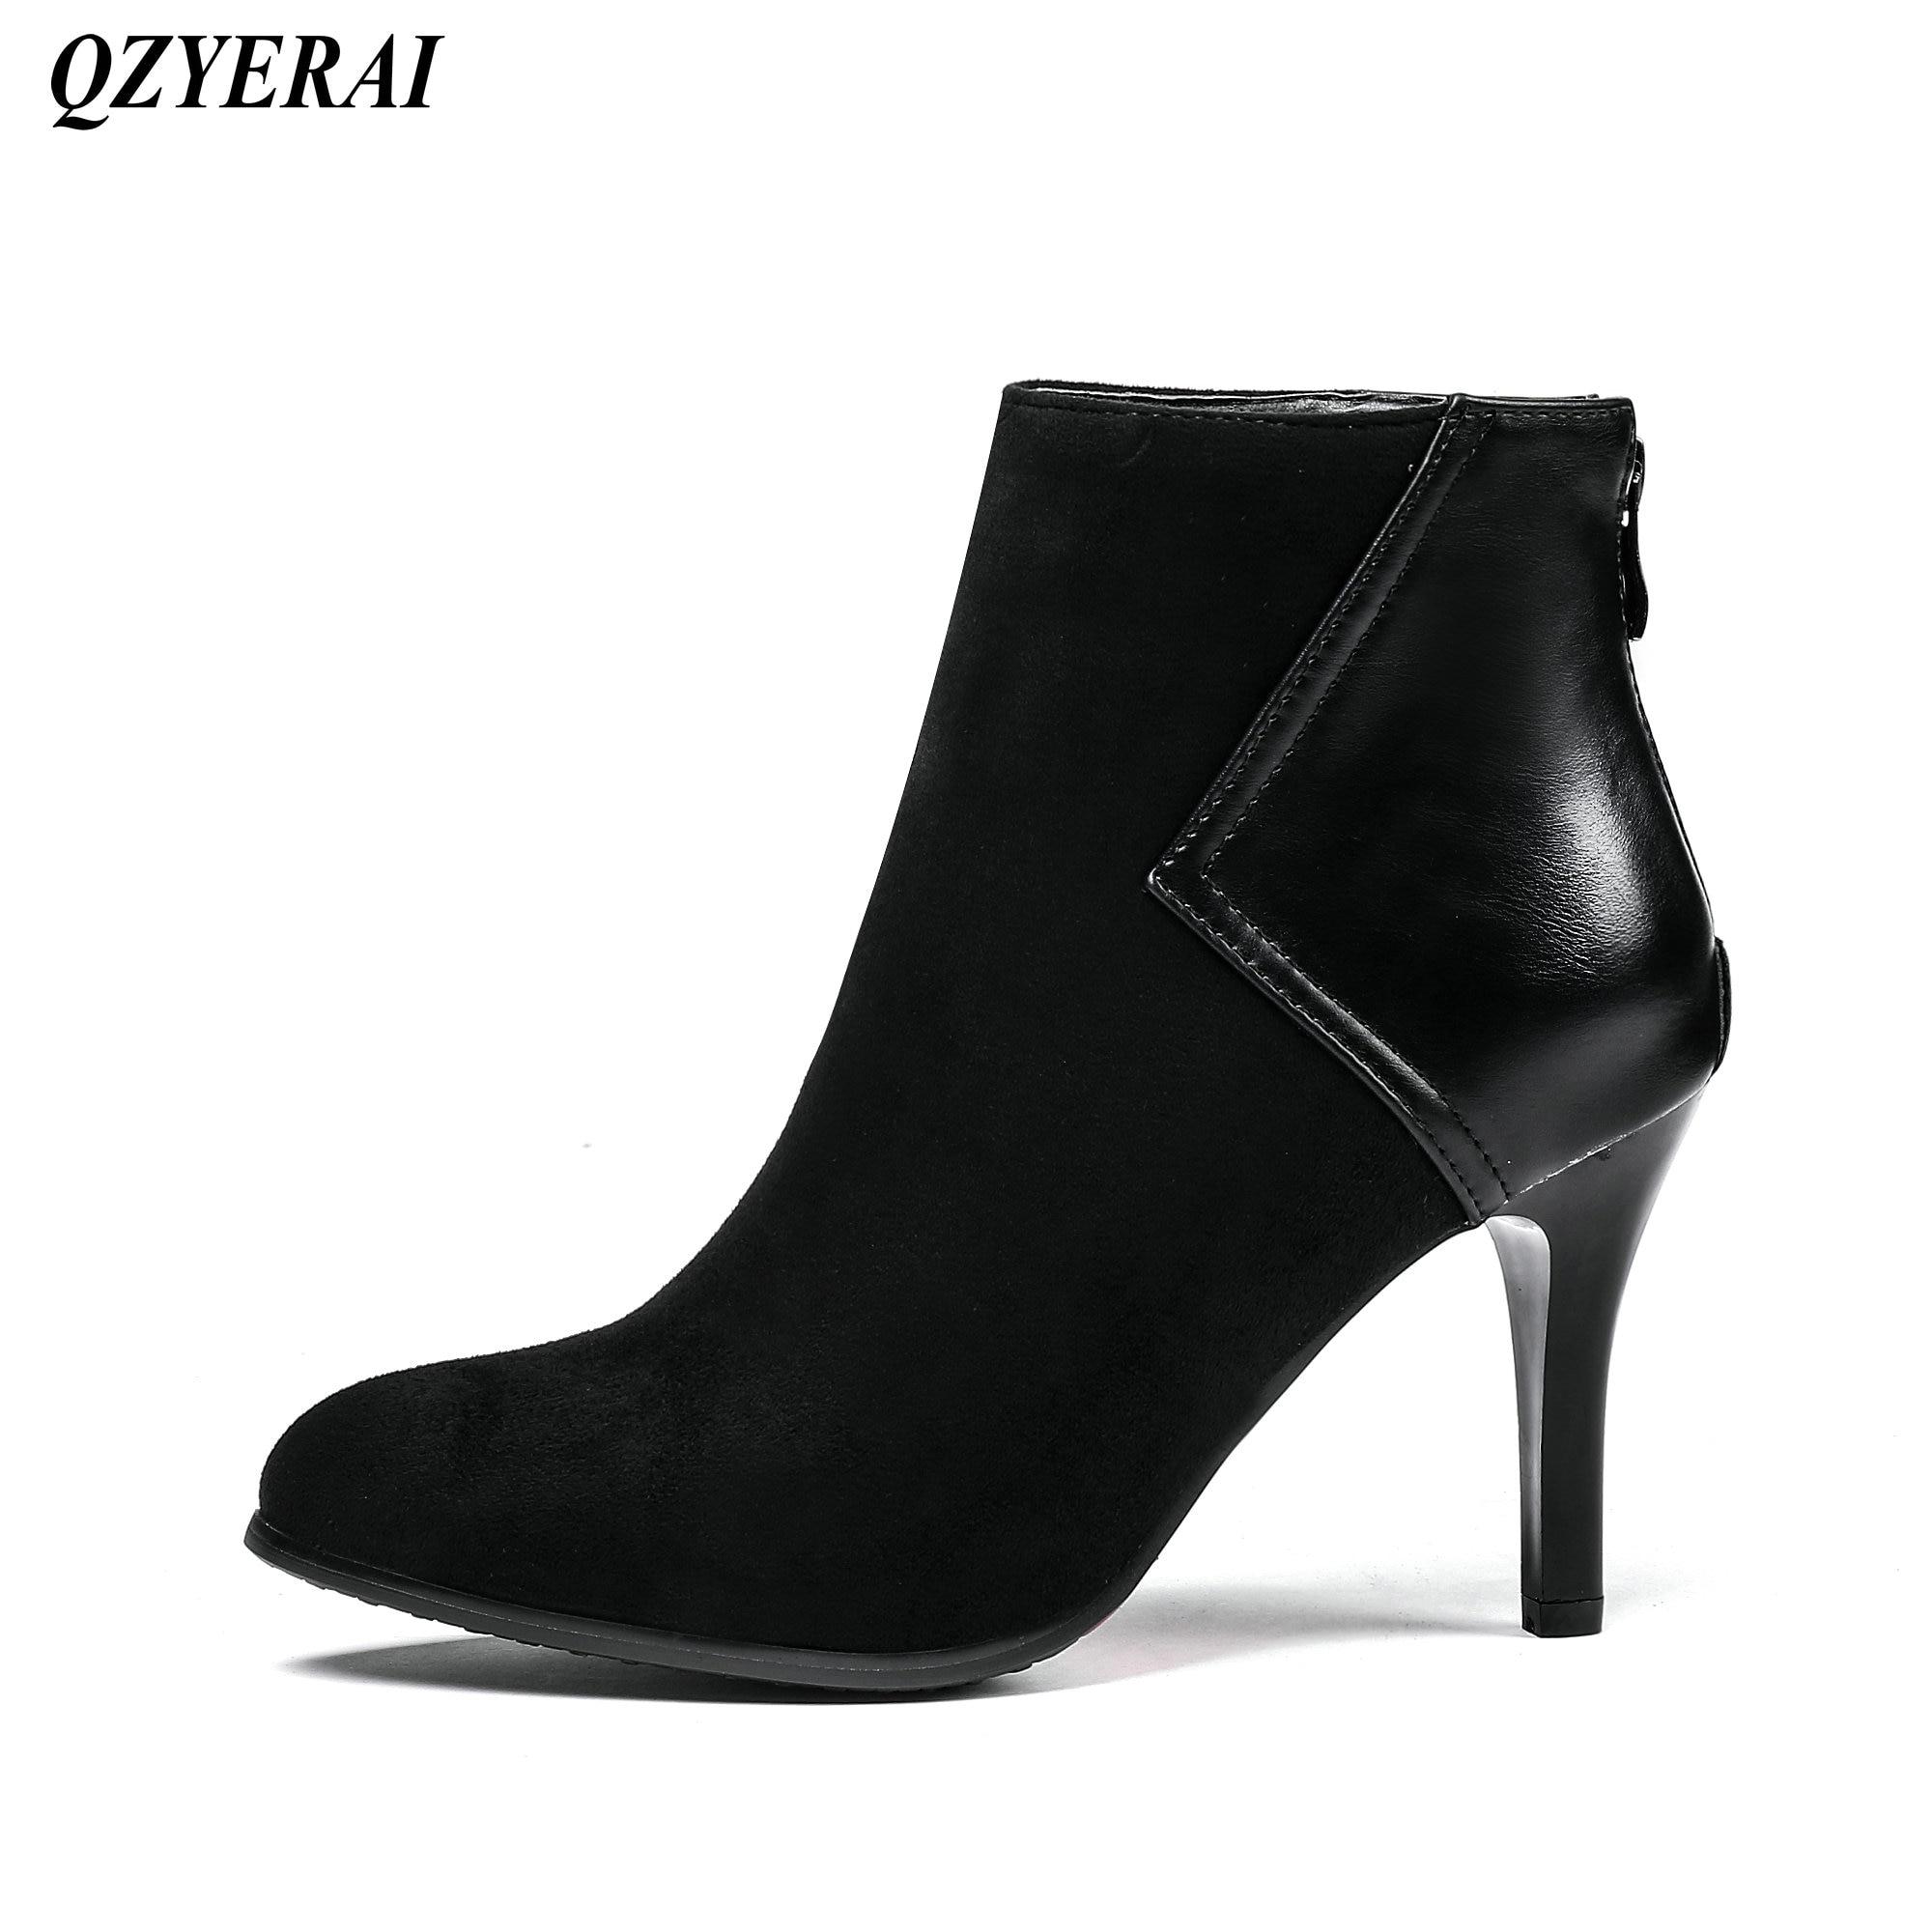 QZYERAI Autumn winter ladies high heels Martin boots font b womens b font boots fashion font